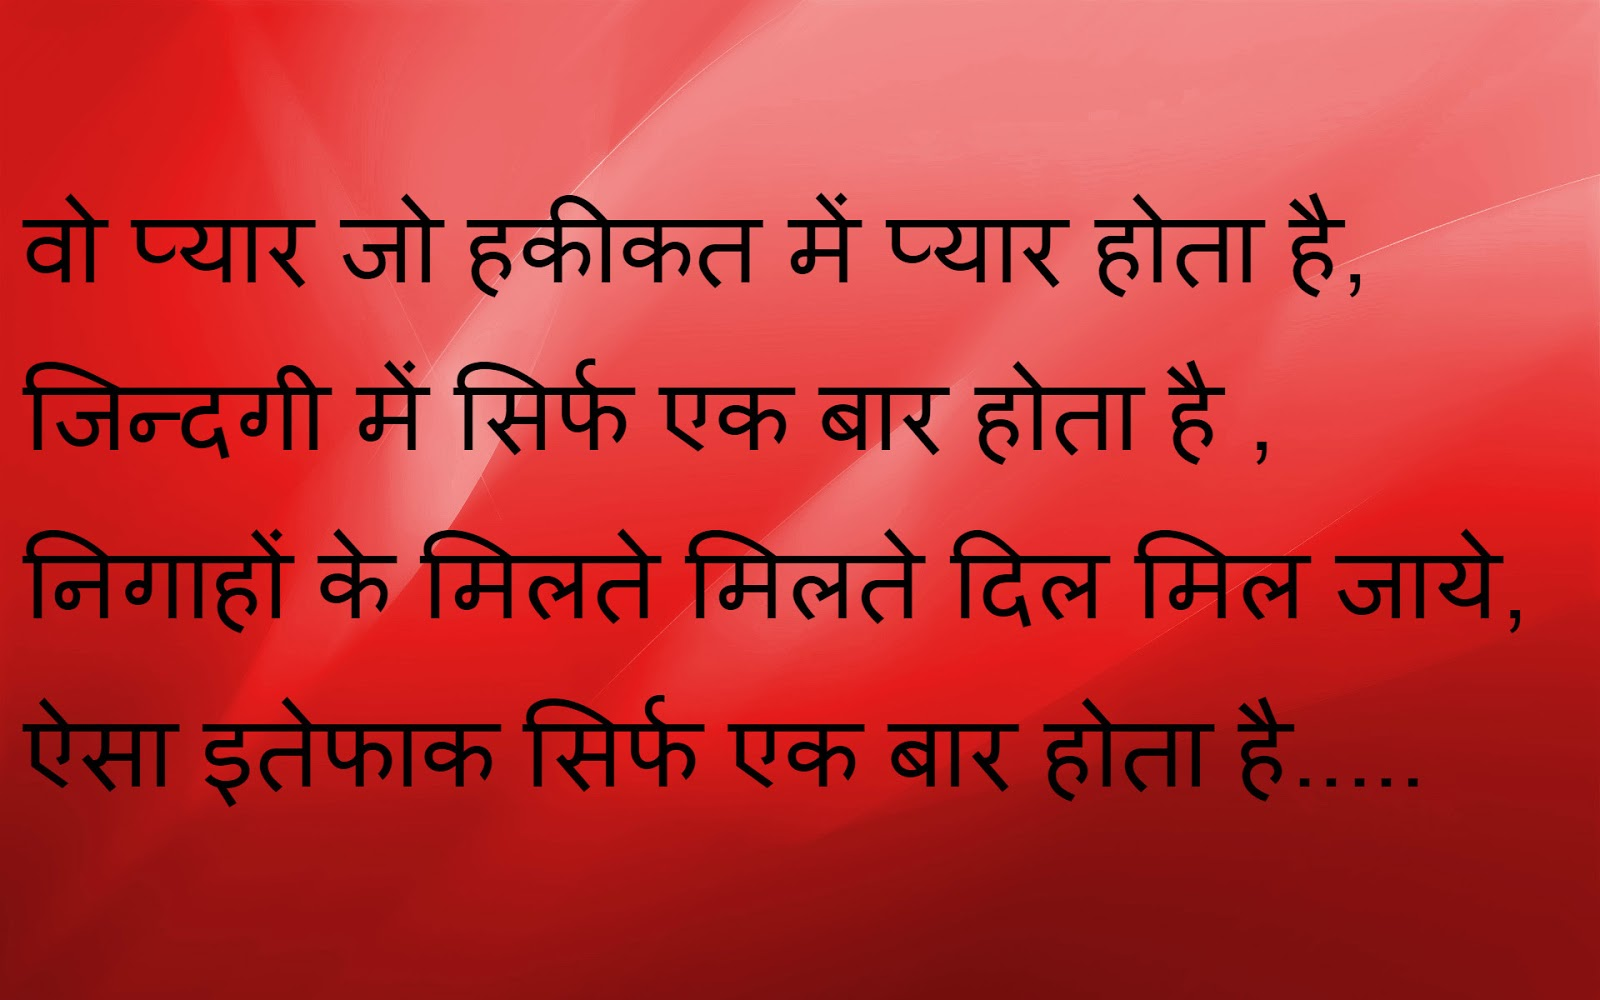 Hindi Romantic Love Wallpapers With Quotes Top30 Hindi Joke Shayari Dosti In English Love Romantic